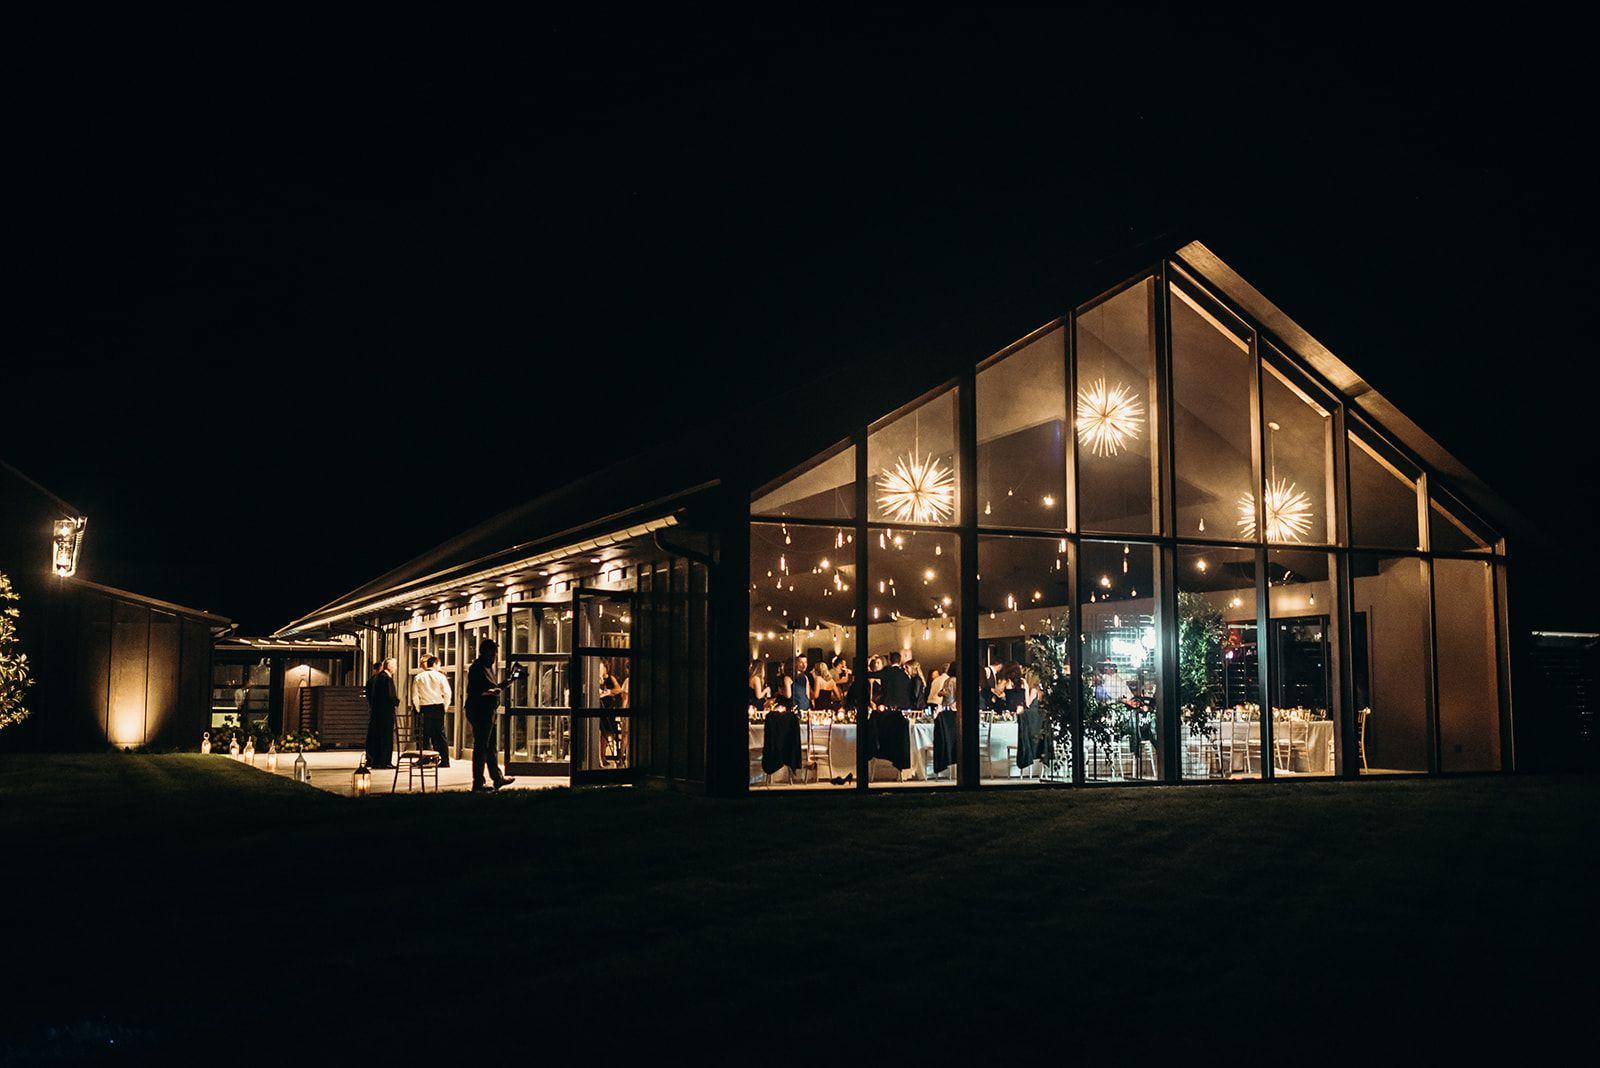 Weddings & Events — Farms in 2020 Beautiful